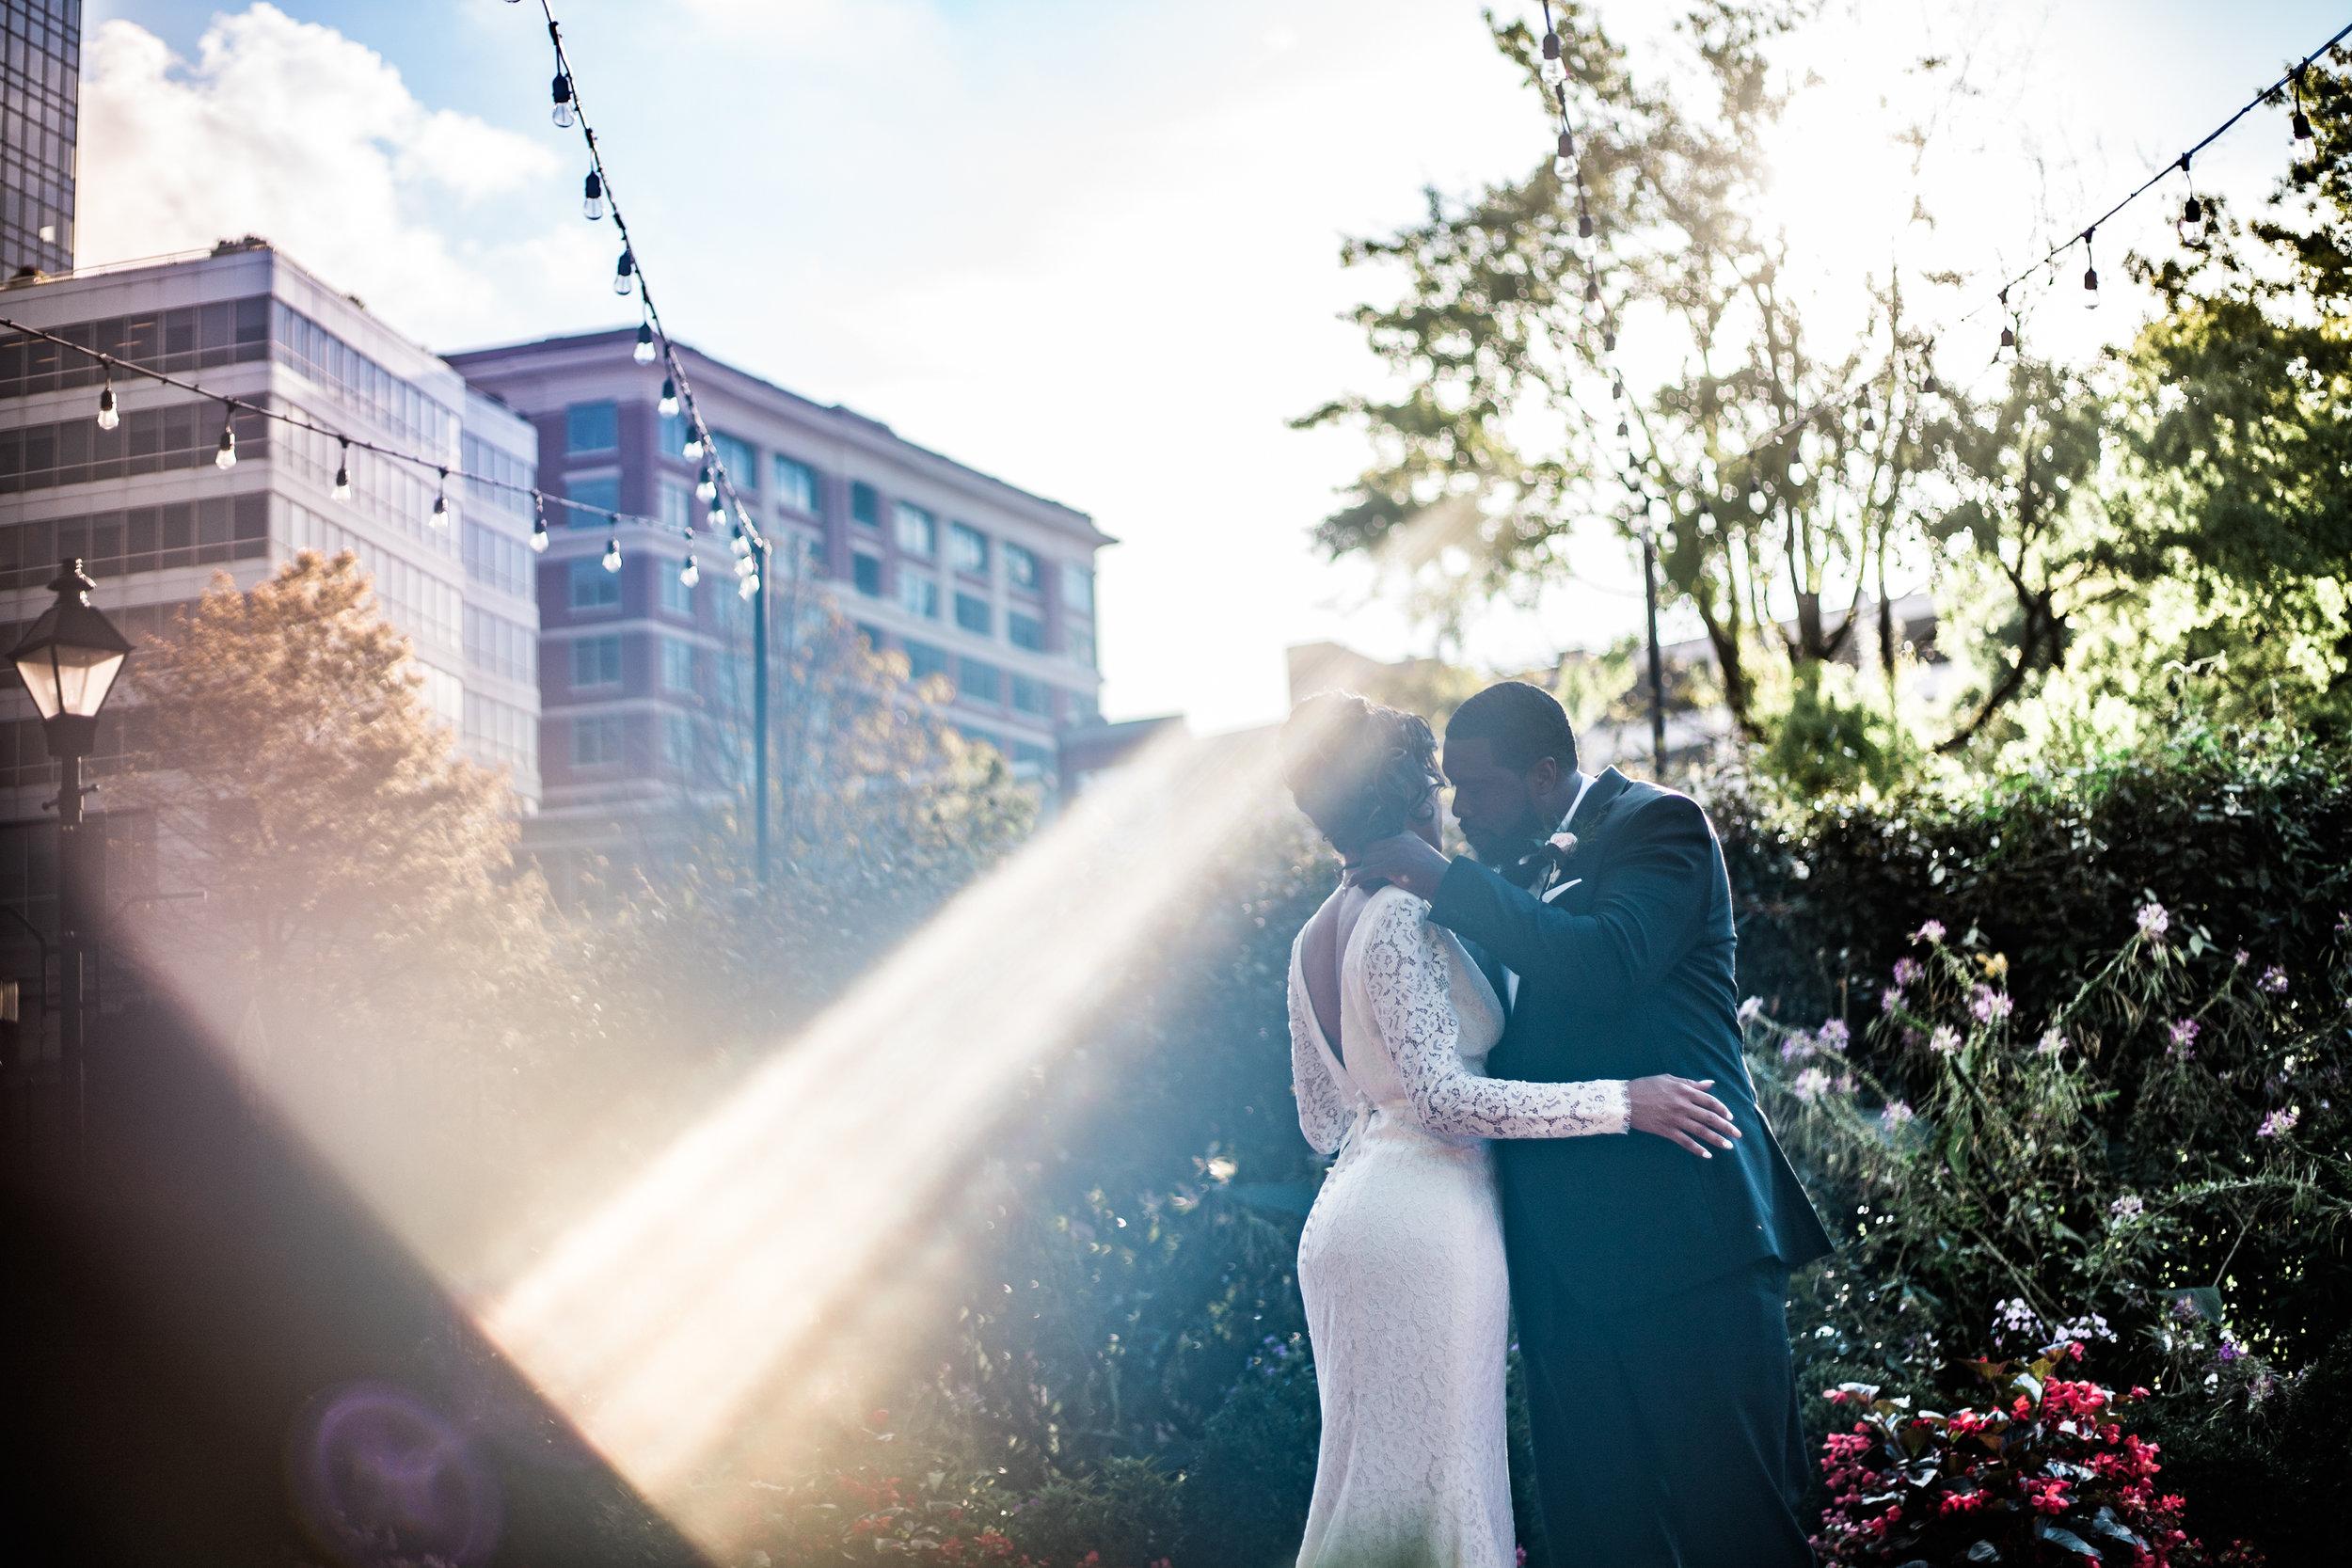 Best Wedding Photographs in Baltimore City Megapixels Media 1840's plaza.jpg